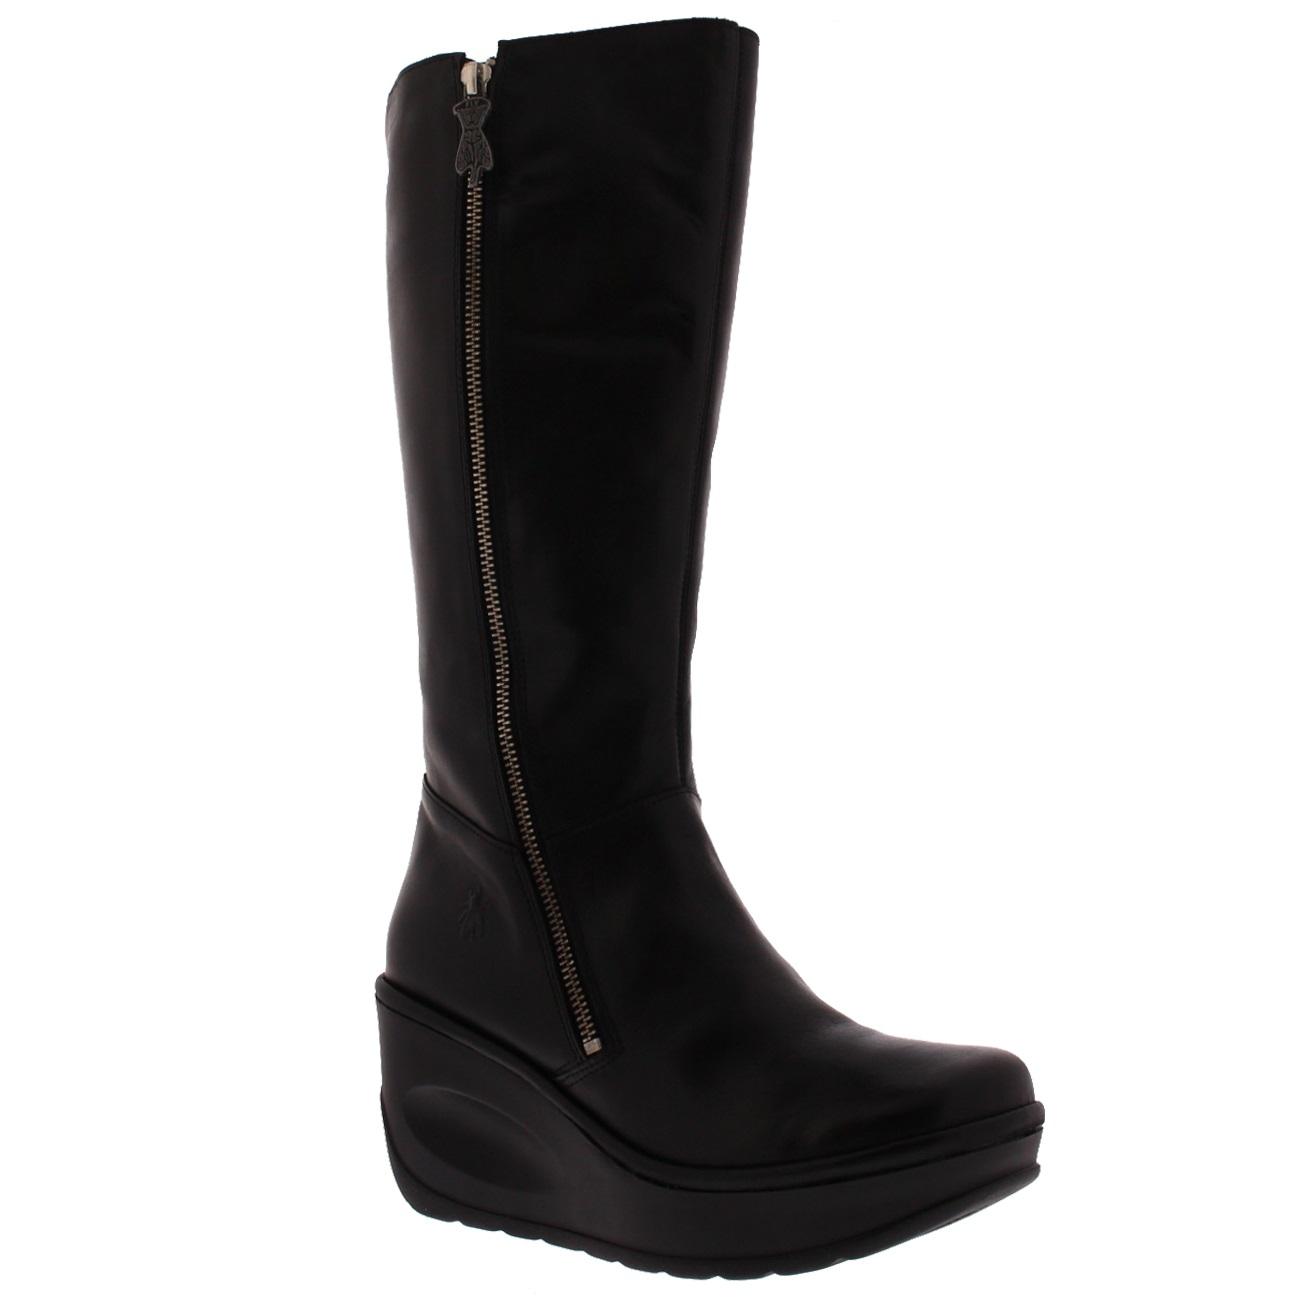 8858bfa5d83 Womens Fly London Jate Fashion Leather Wedge Heel Knee High Winter ...